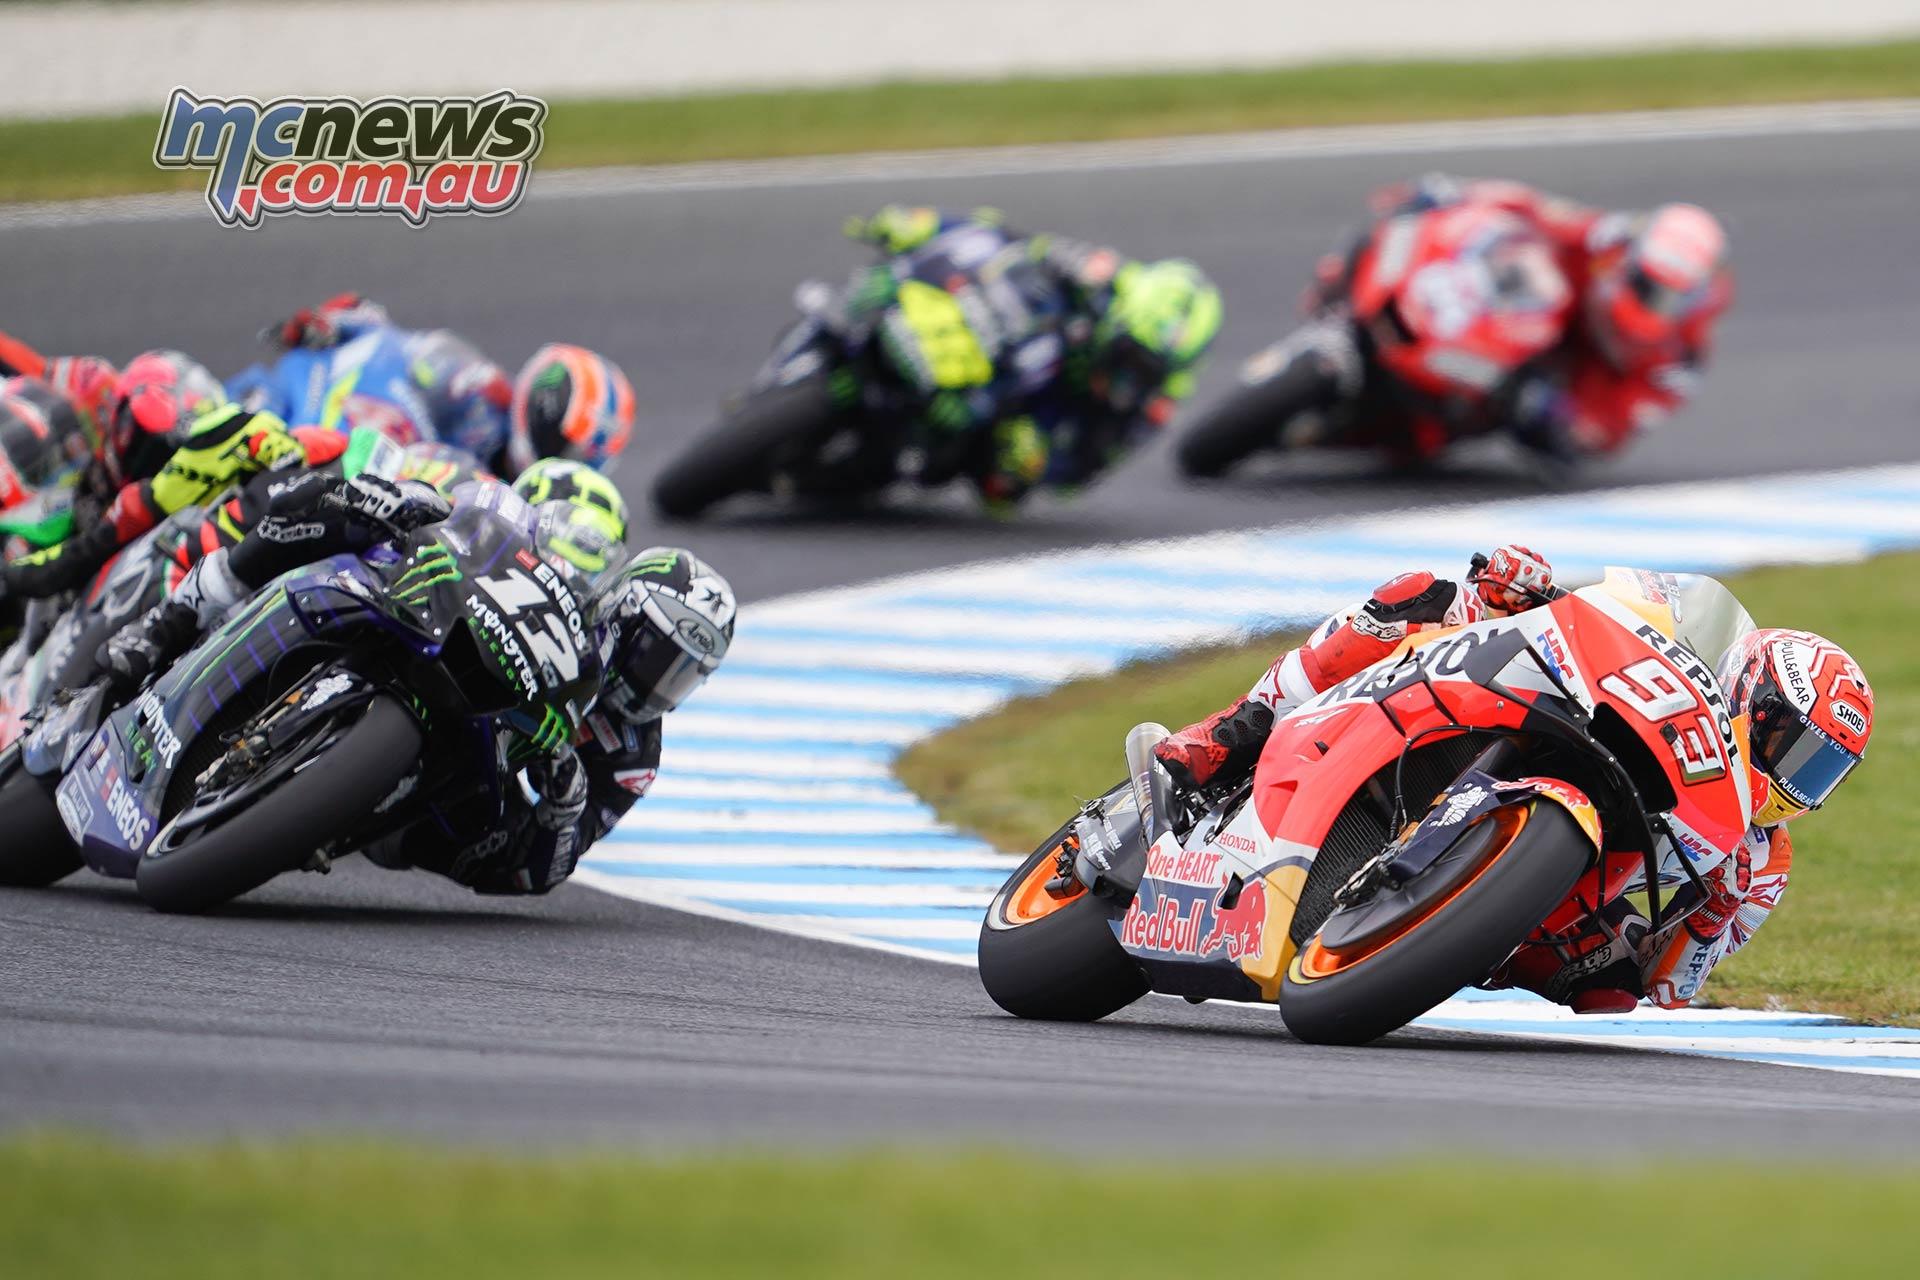 MotoGP Phillip Island Australia Race Marquez Vinales Pack